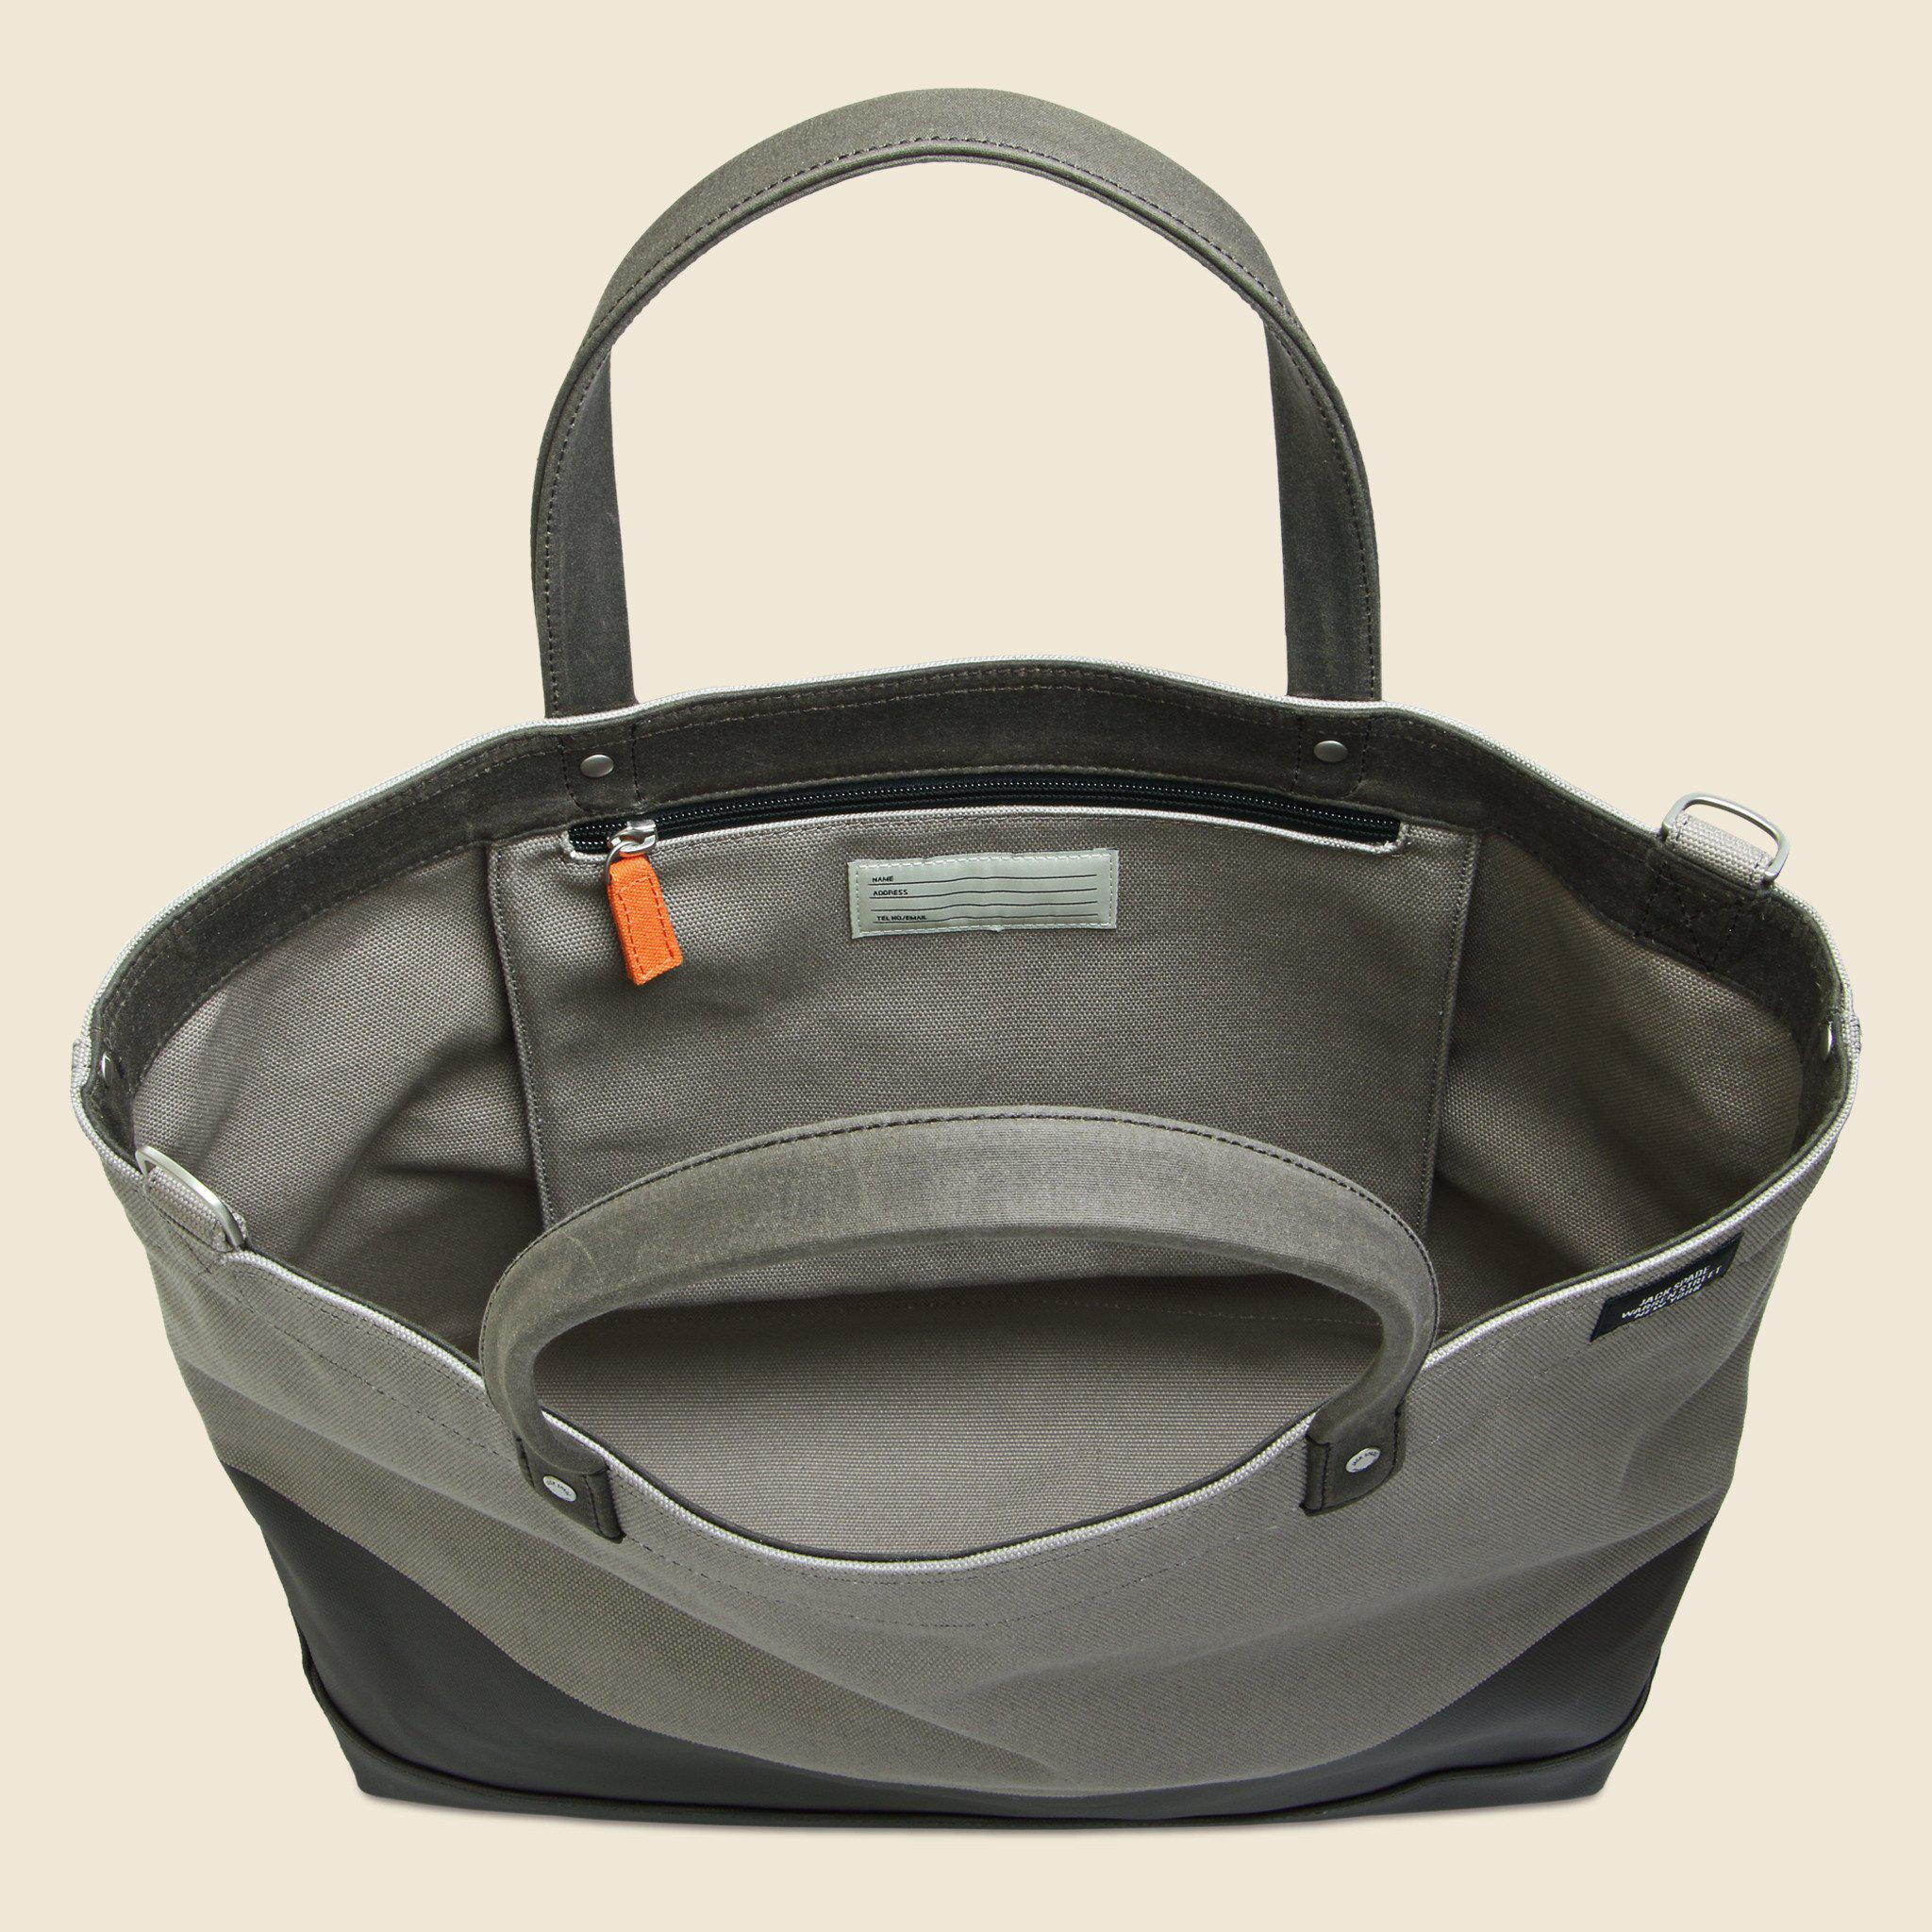 bc75e24aa Jack Spade Dipped Industrial Canvas Coal Bag - Granite/brown in ...